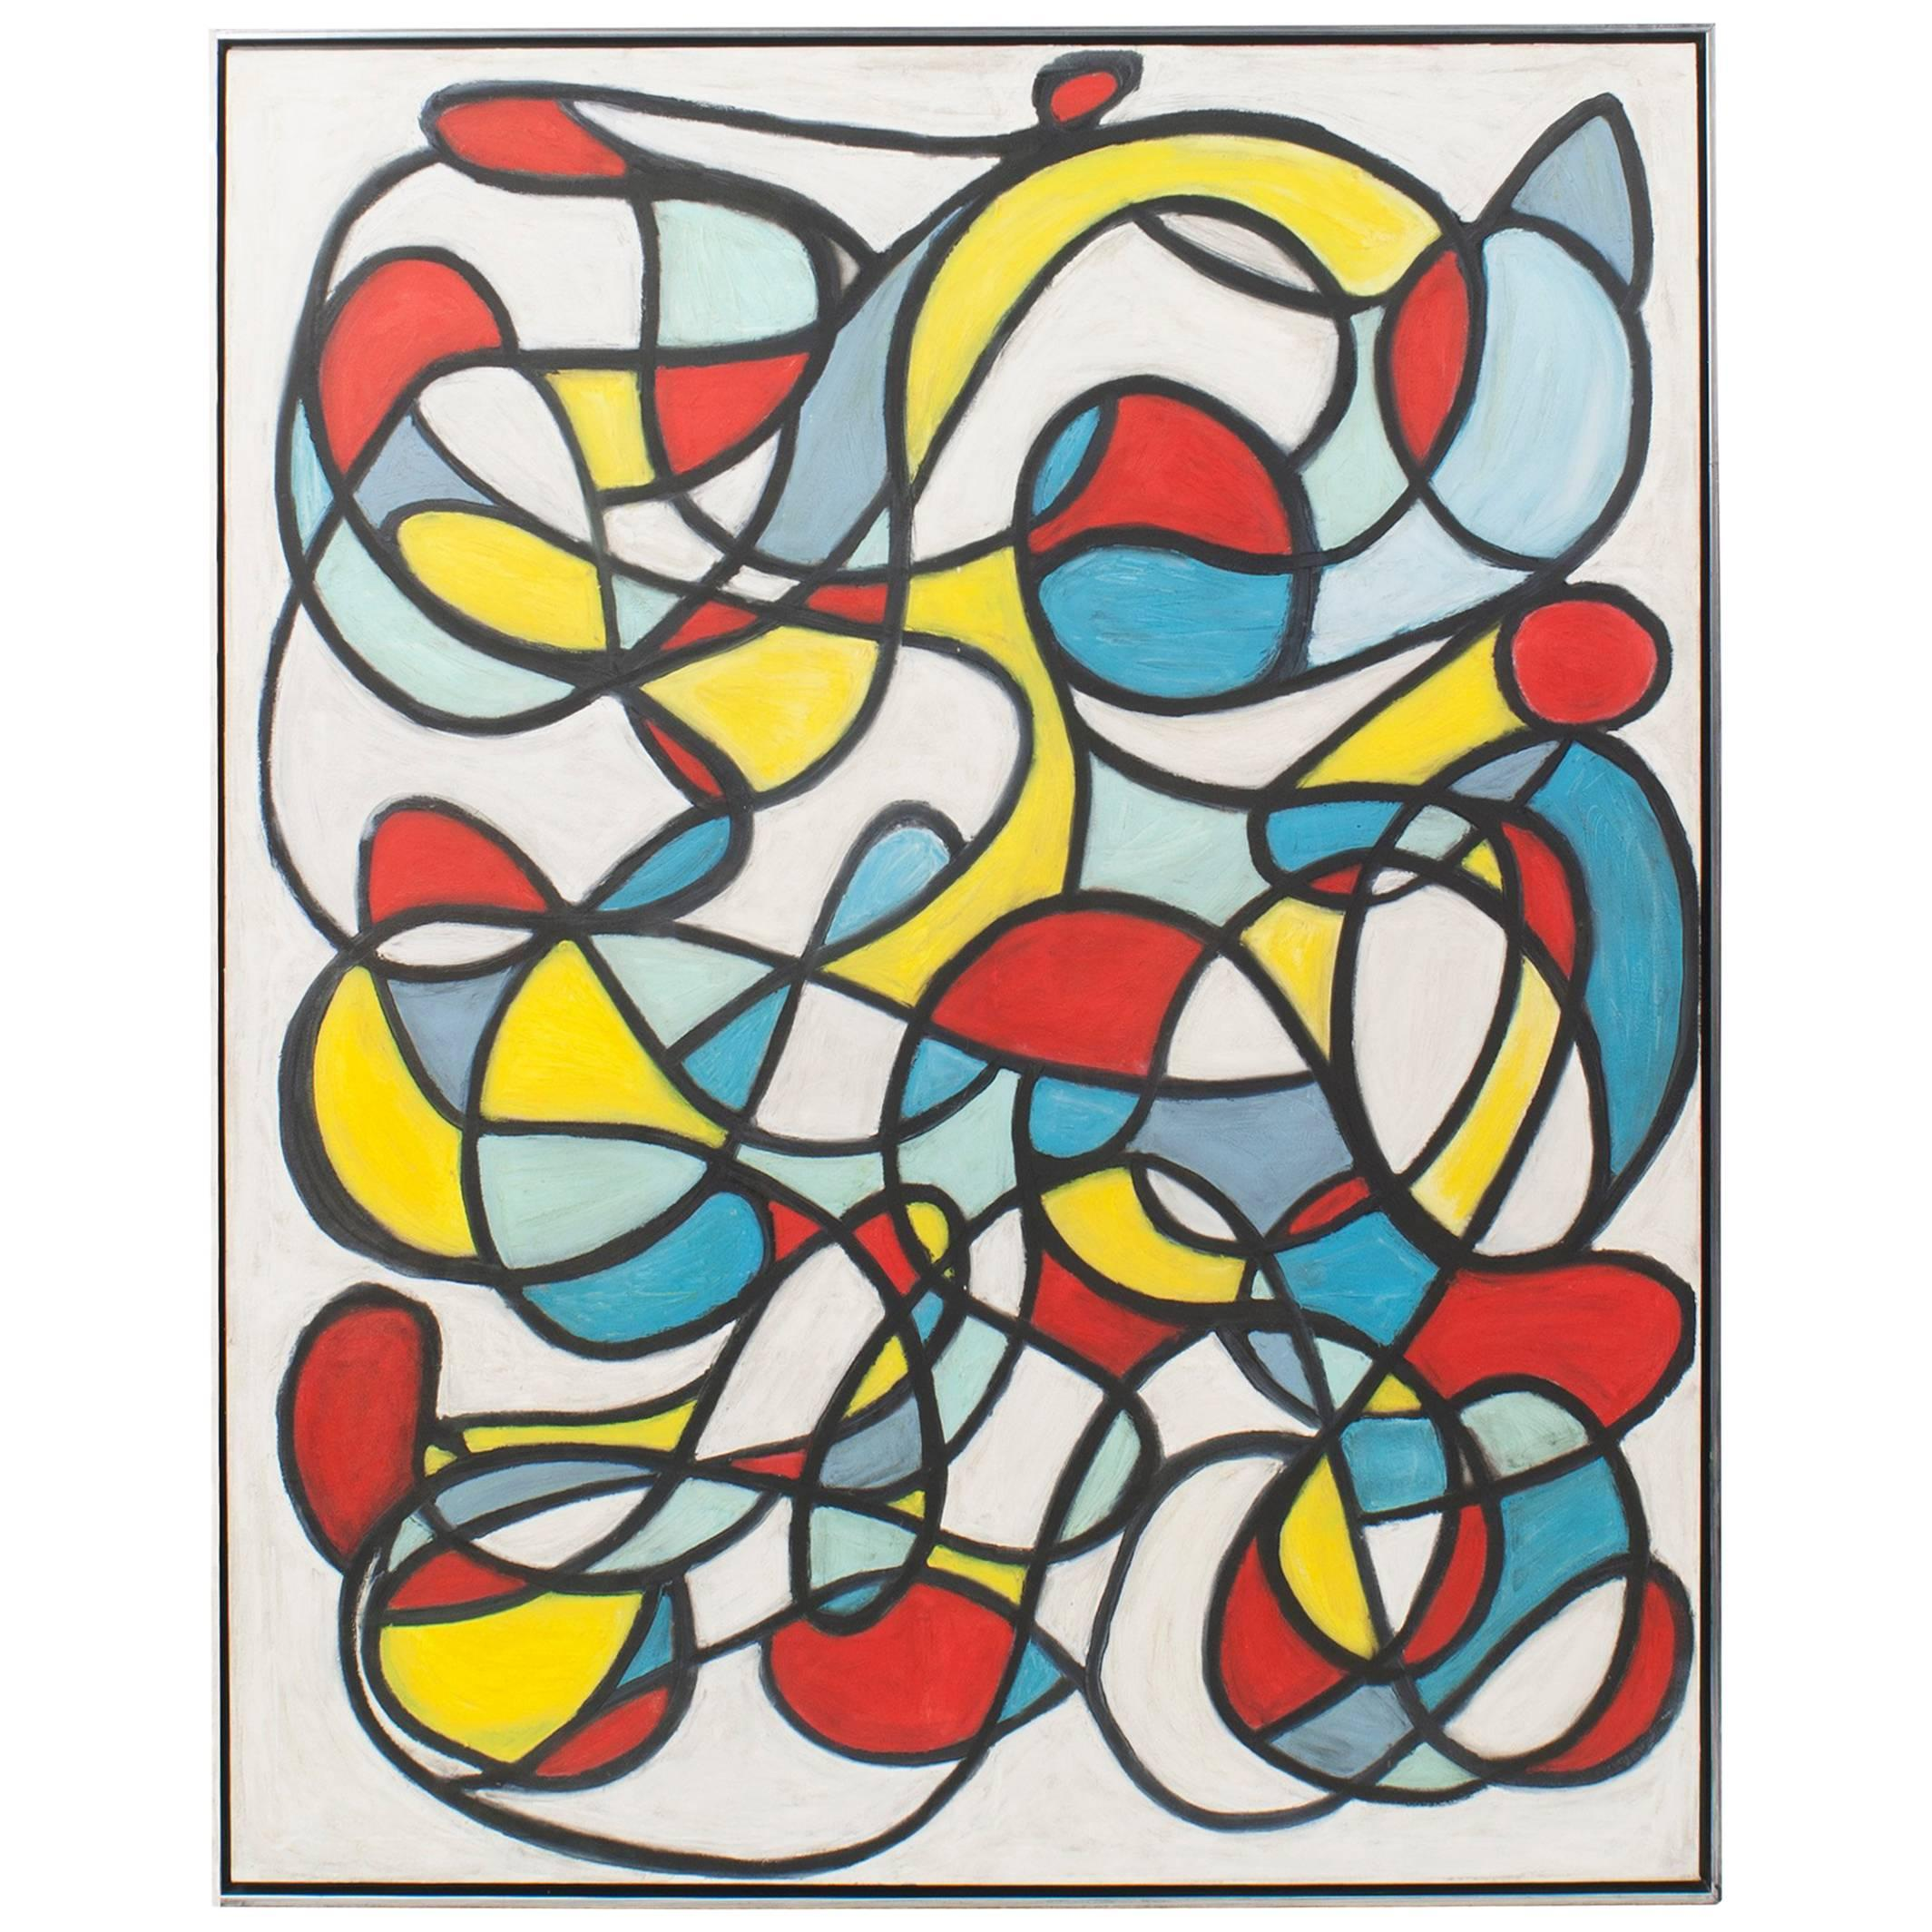 """The Cyclist"" by Ricardo Rumi, 2009"